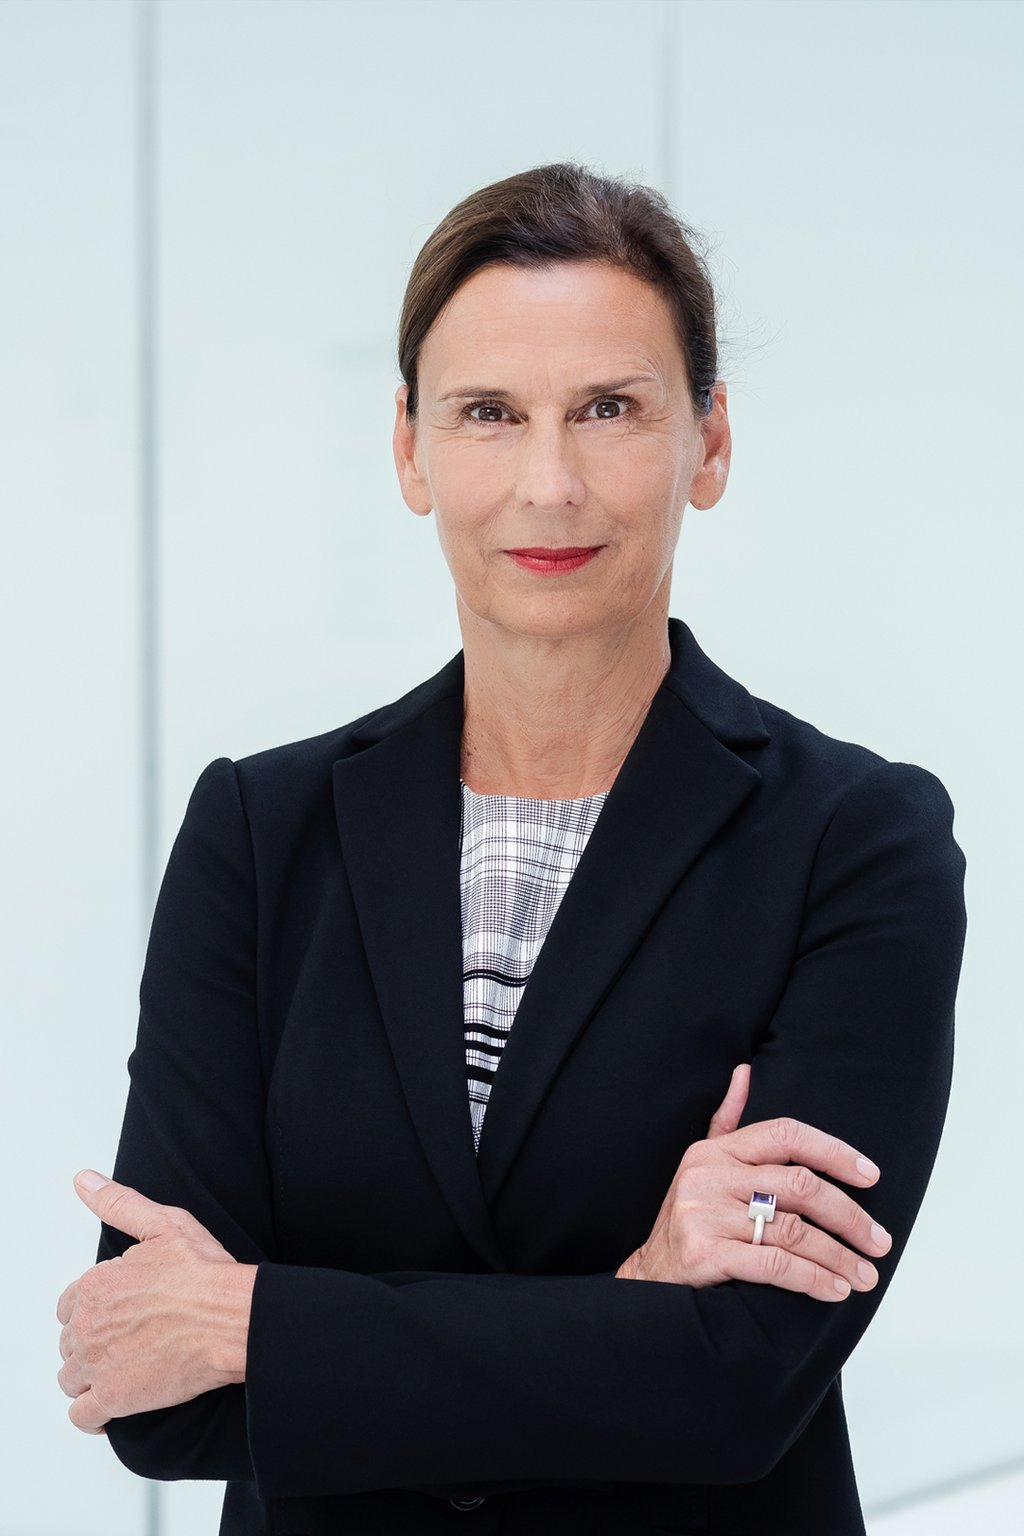 PROF. DR. GESINE GRANDE